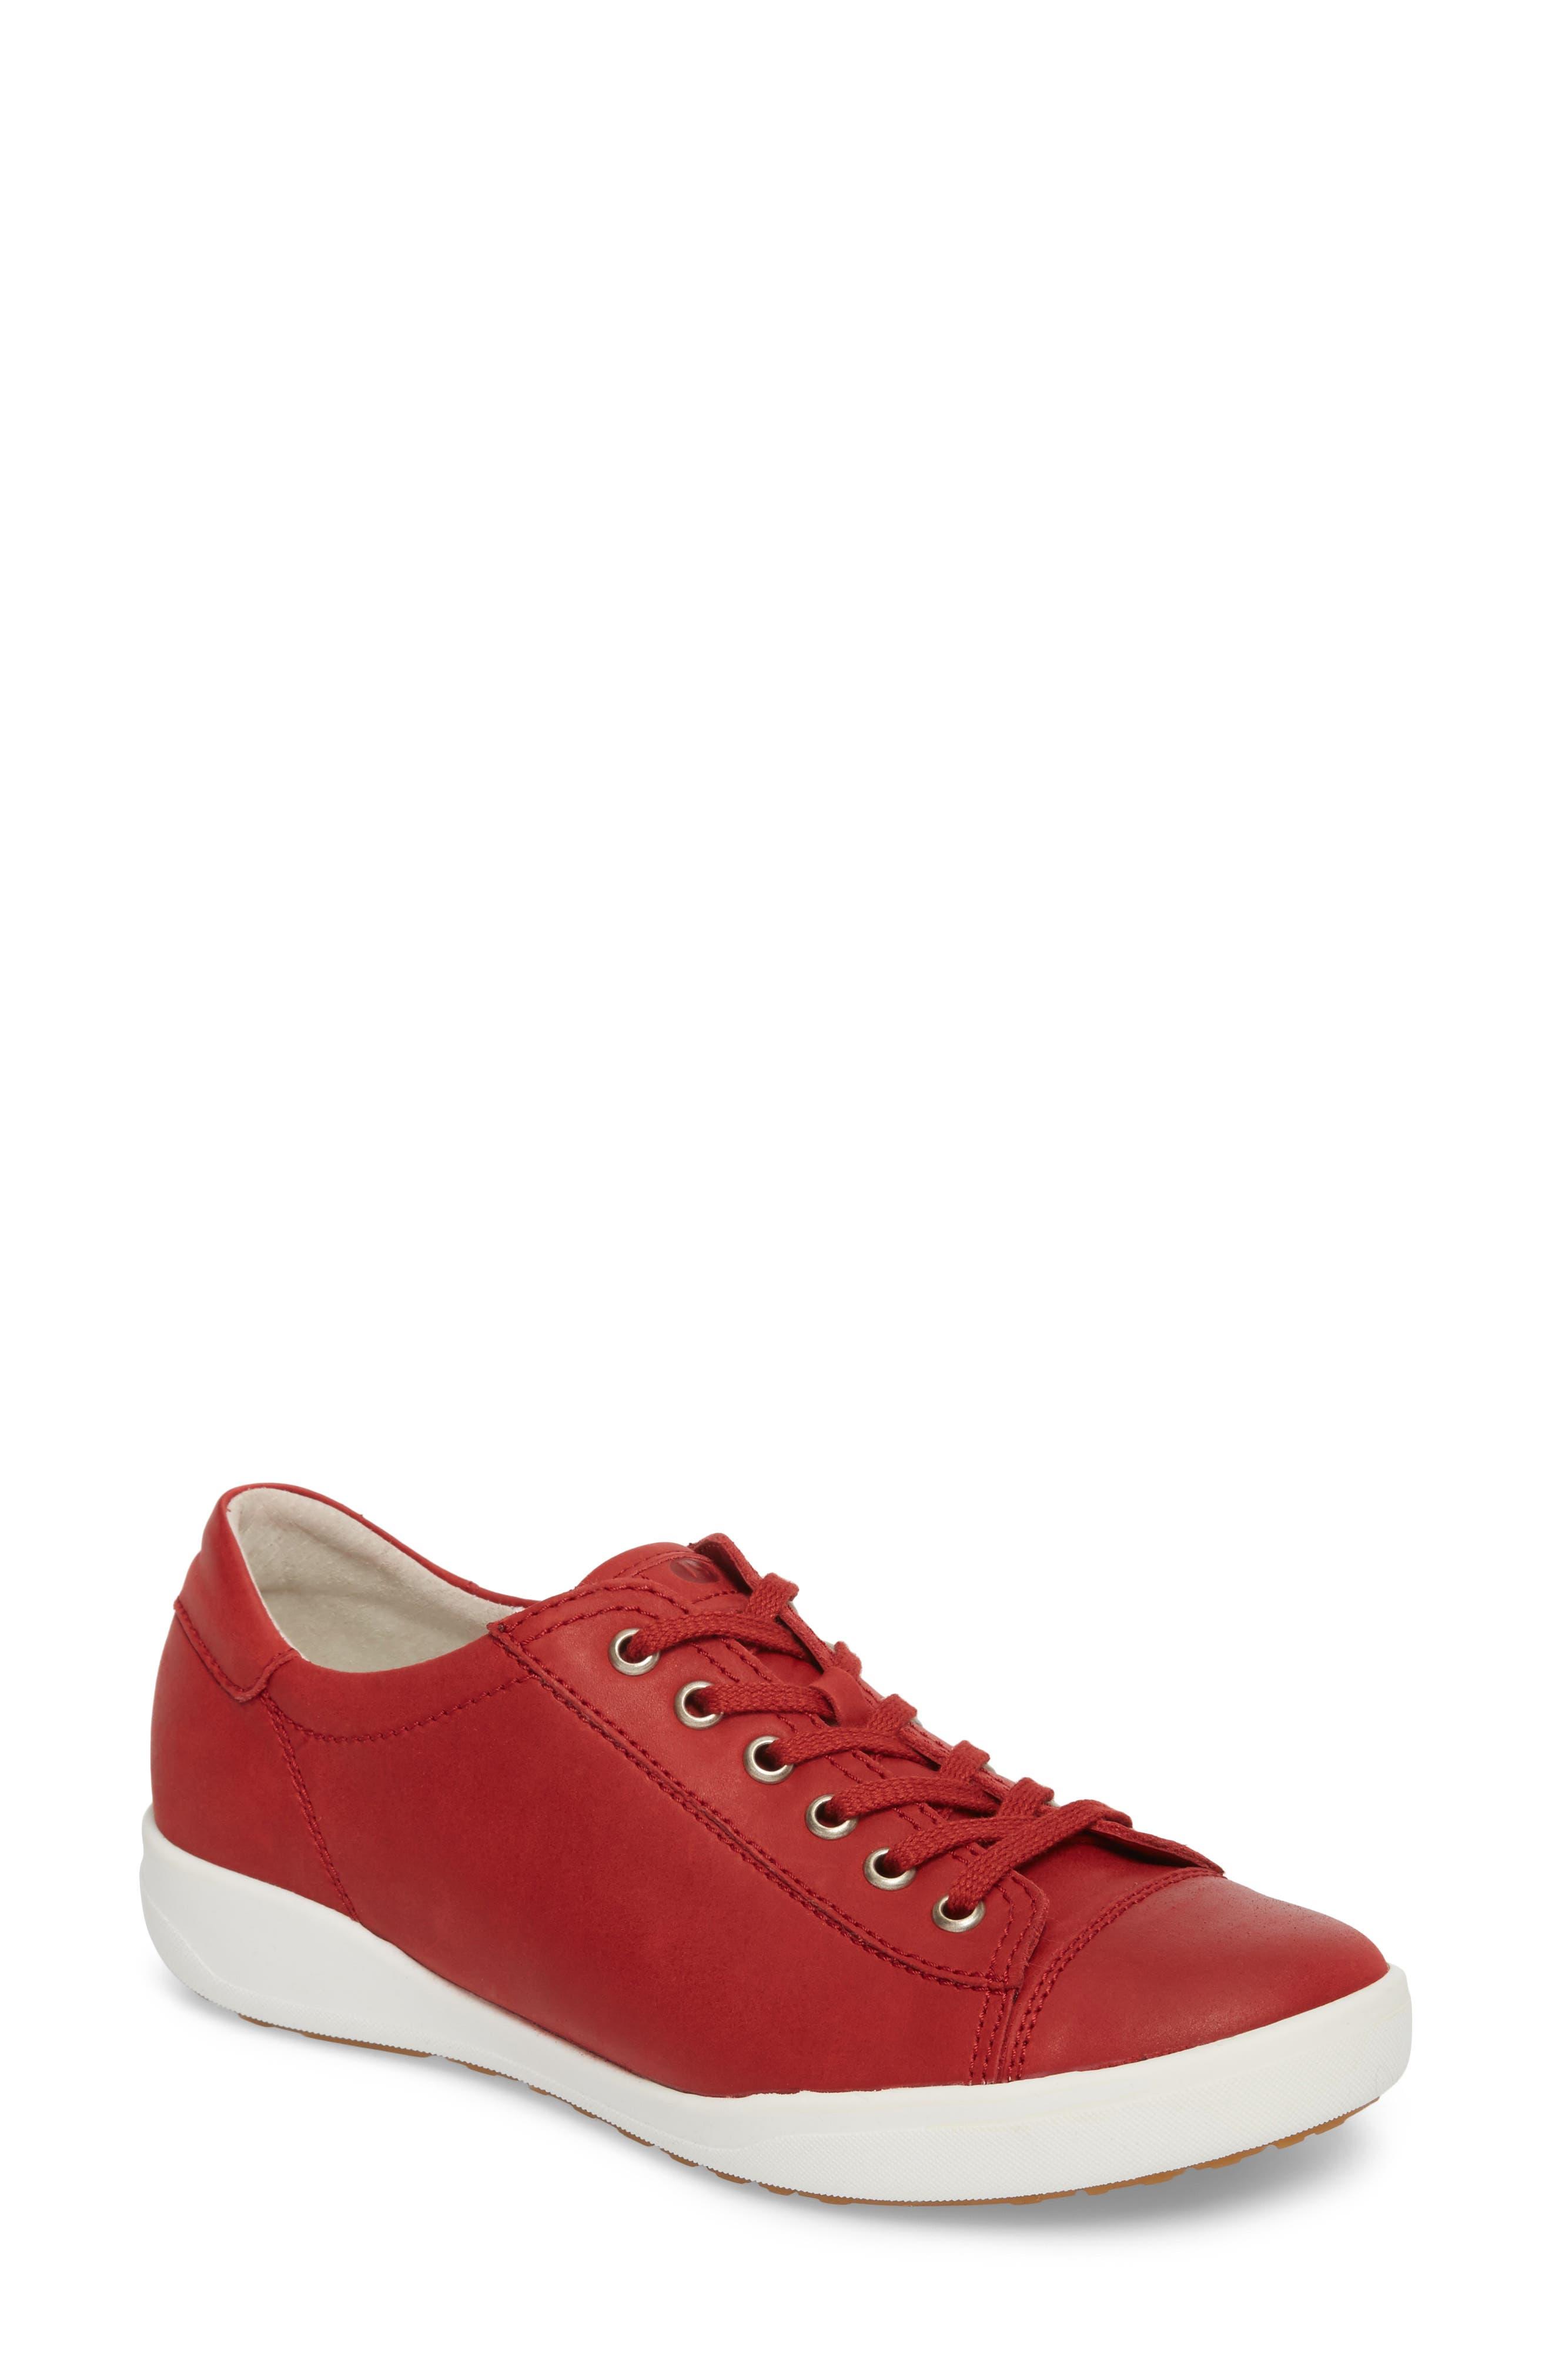 Josef Seibel Sina 11 Sneaker, Red